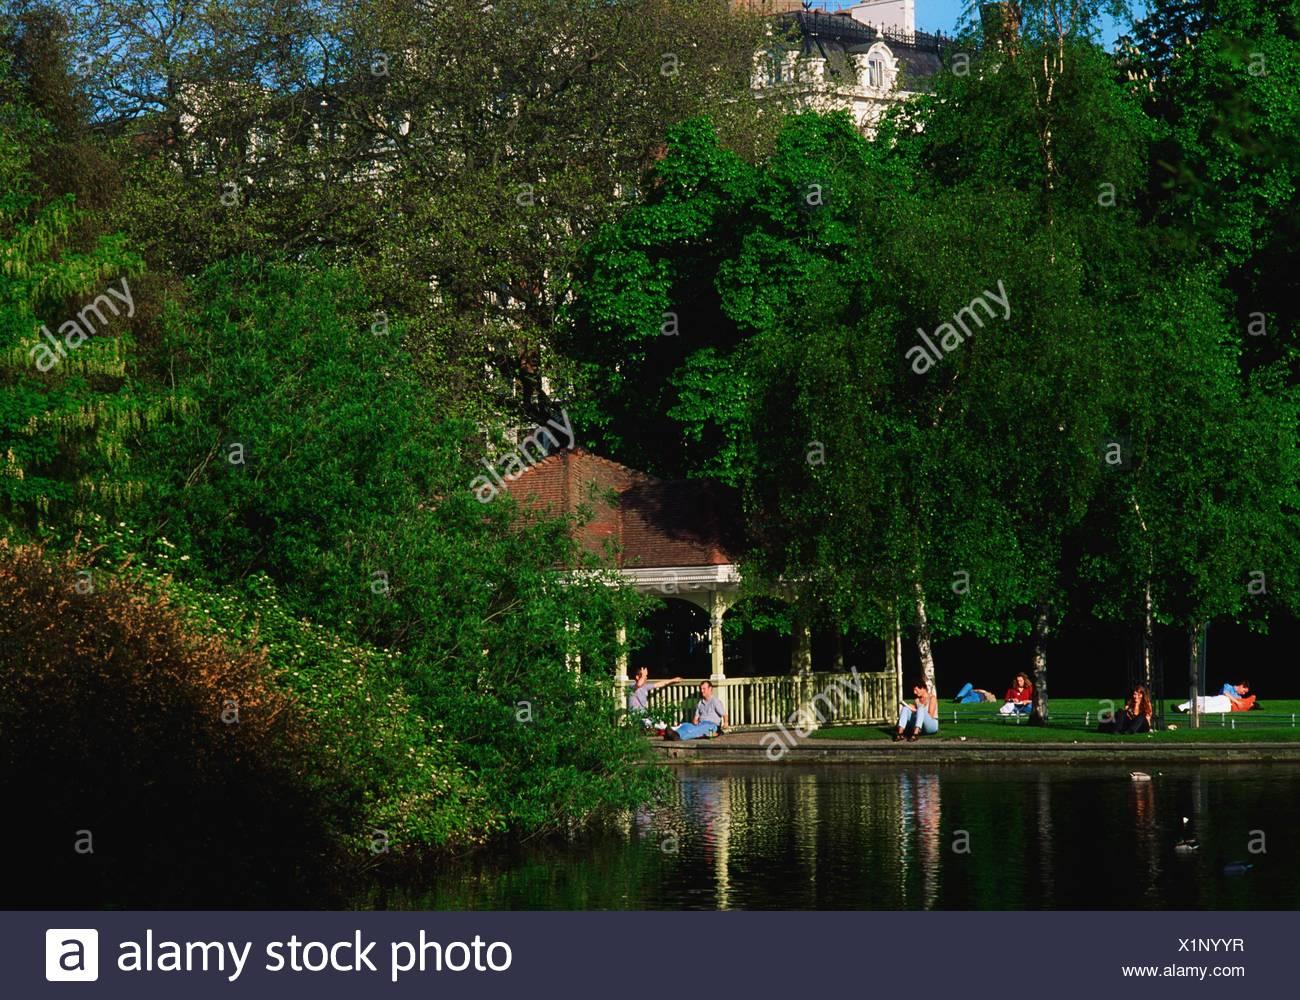 St Stephen's Green, Dublin, Co Dublin, Ireland; People Sitting In One Of Dublin's Public Parks - Stock Image